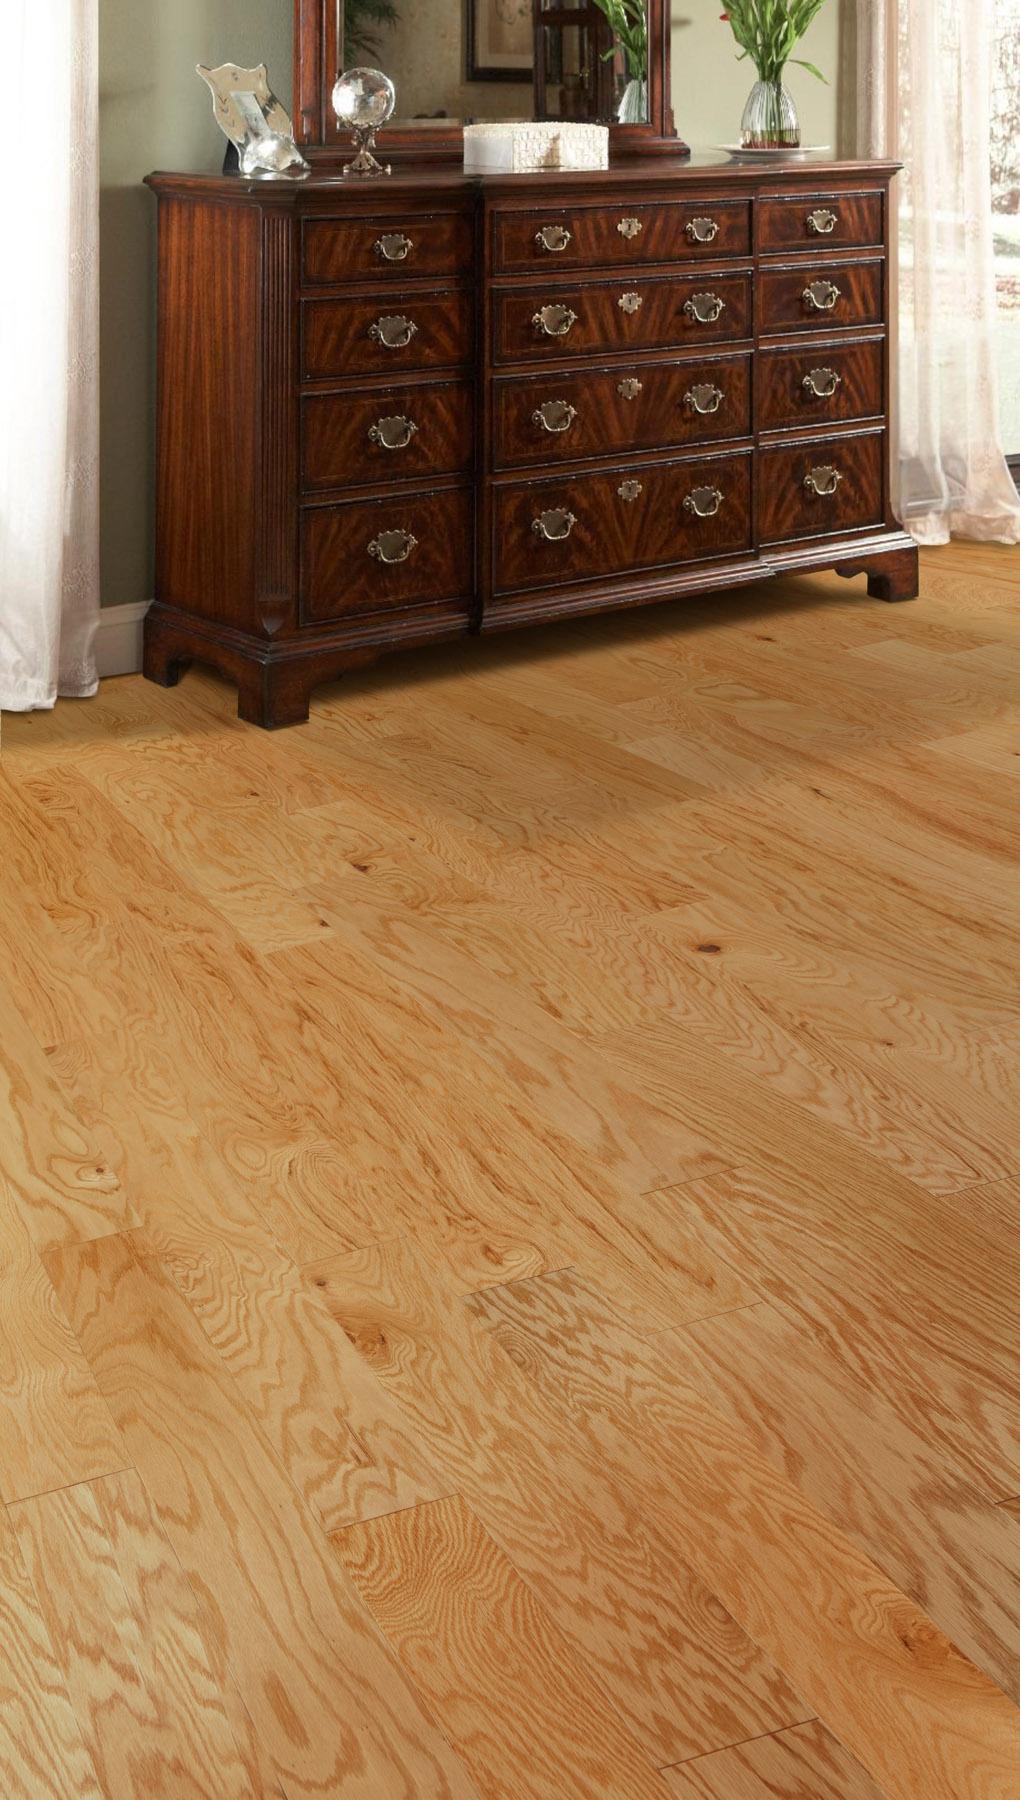 Lm Flooring Lm Hardwood Floors Discount L Amp M Wood